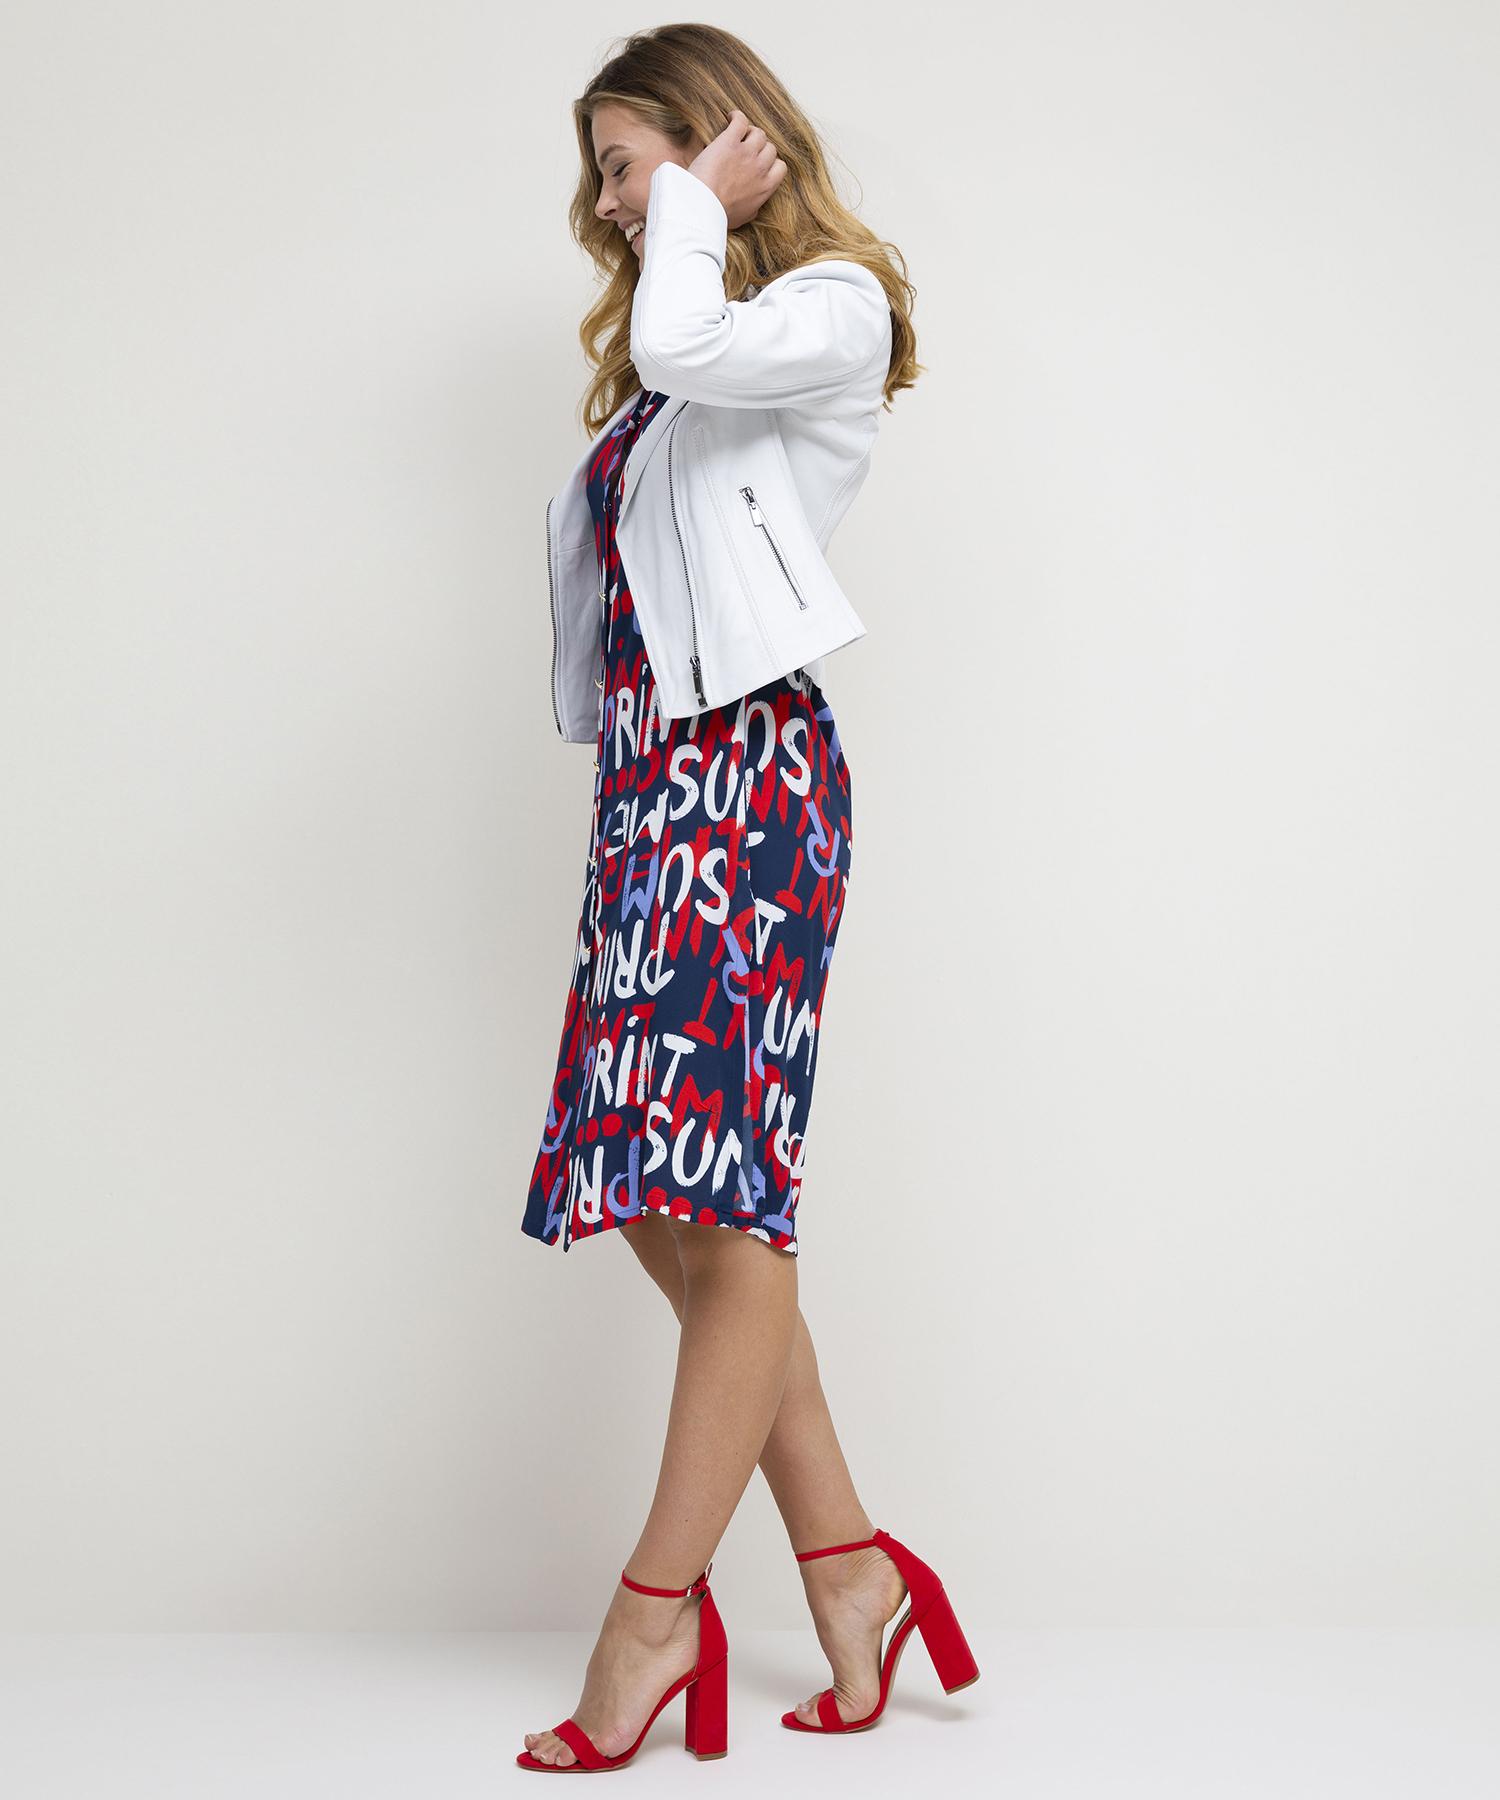 Caroline Biss letterprint jurk